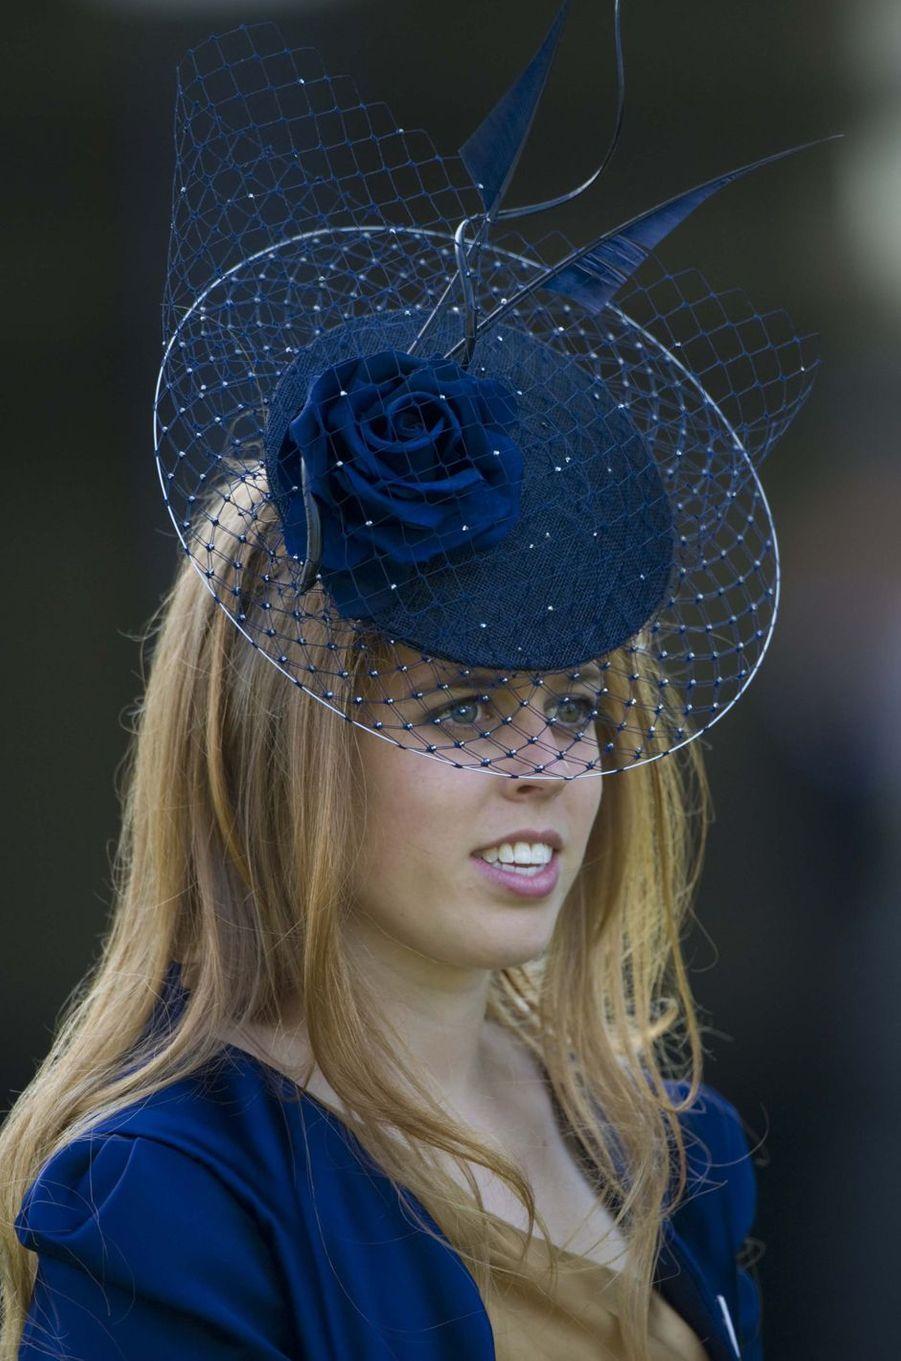 La princesse Beatrice d'York, le 17 juin 2010